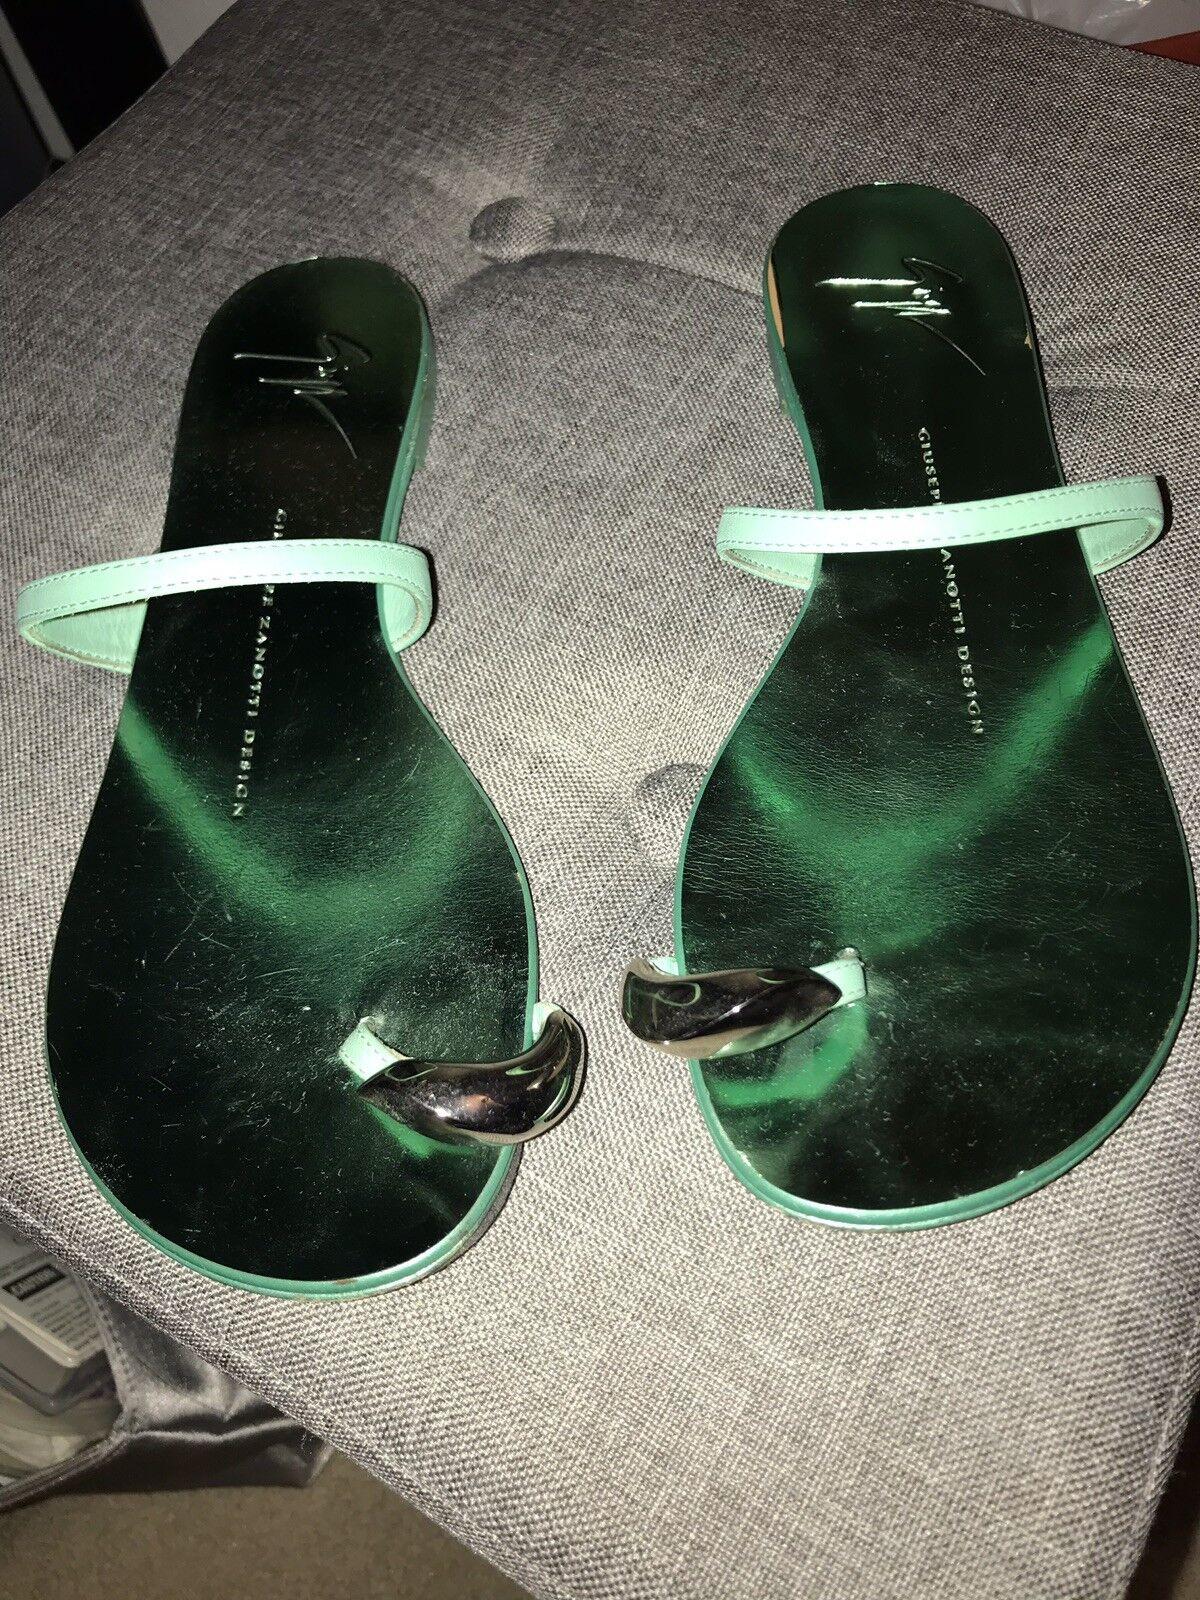 Authentic Guiseppe Zanotti Toe Ring Sandal Slipper. Dimensione Dimensione Dimensione 36 6 f66bdc